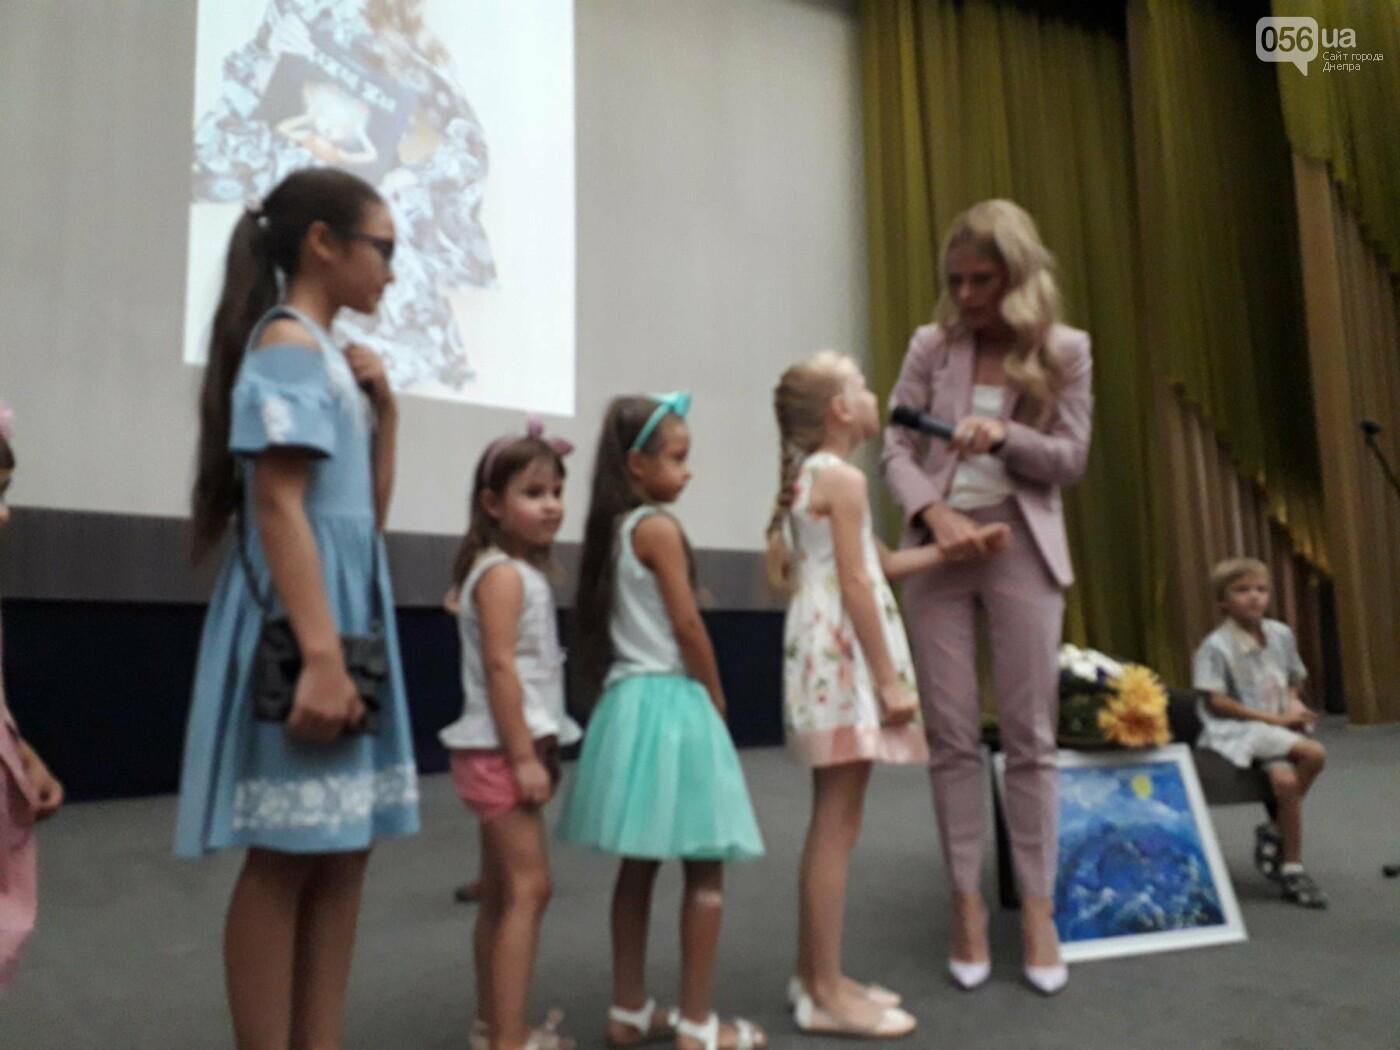 В Днепре Ольга Фреймут презентовала книгу для детей,  - ФОТО, фото-9